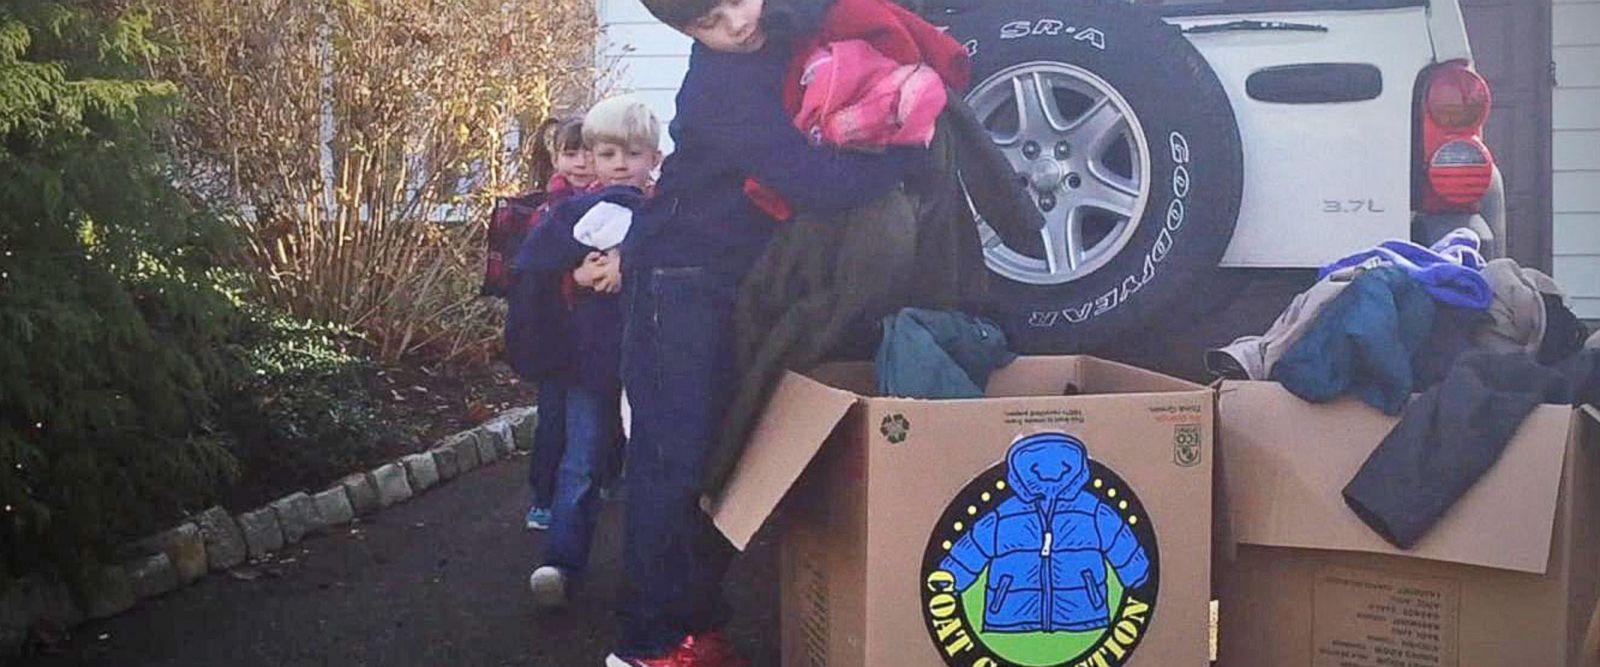 VIDEO: Warm Coats, Warm Hearts Coat Drive Collects Over 1M Coats